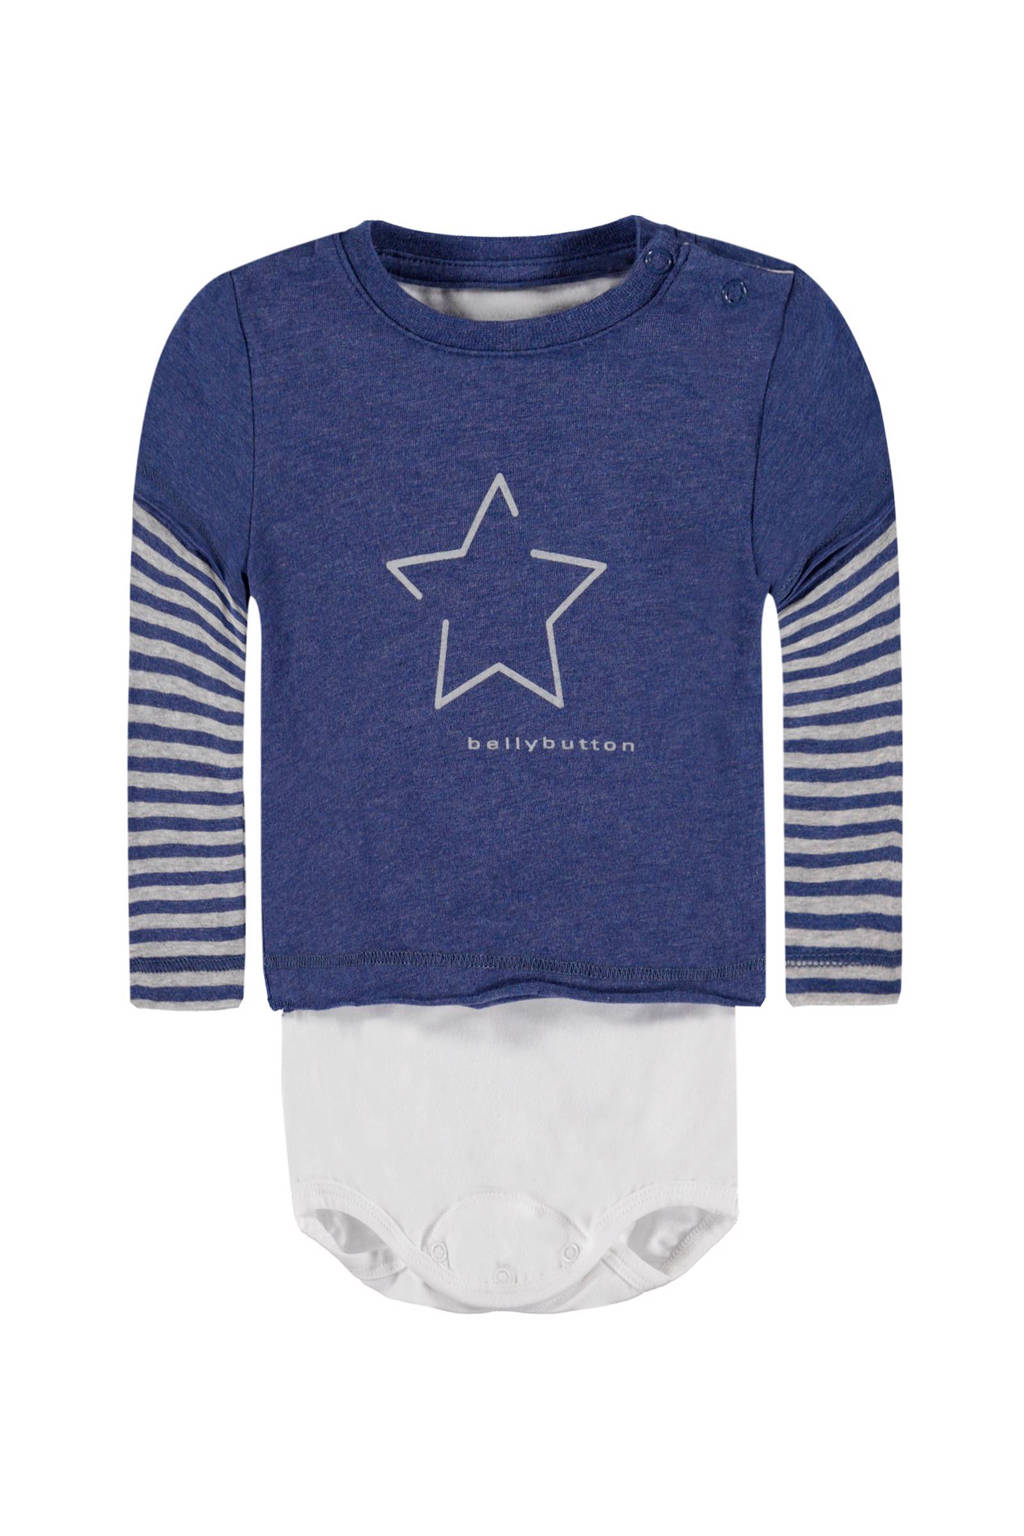 bellybutton T-shirt, Blauw/wit